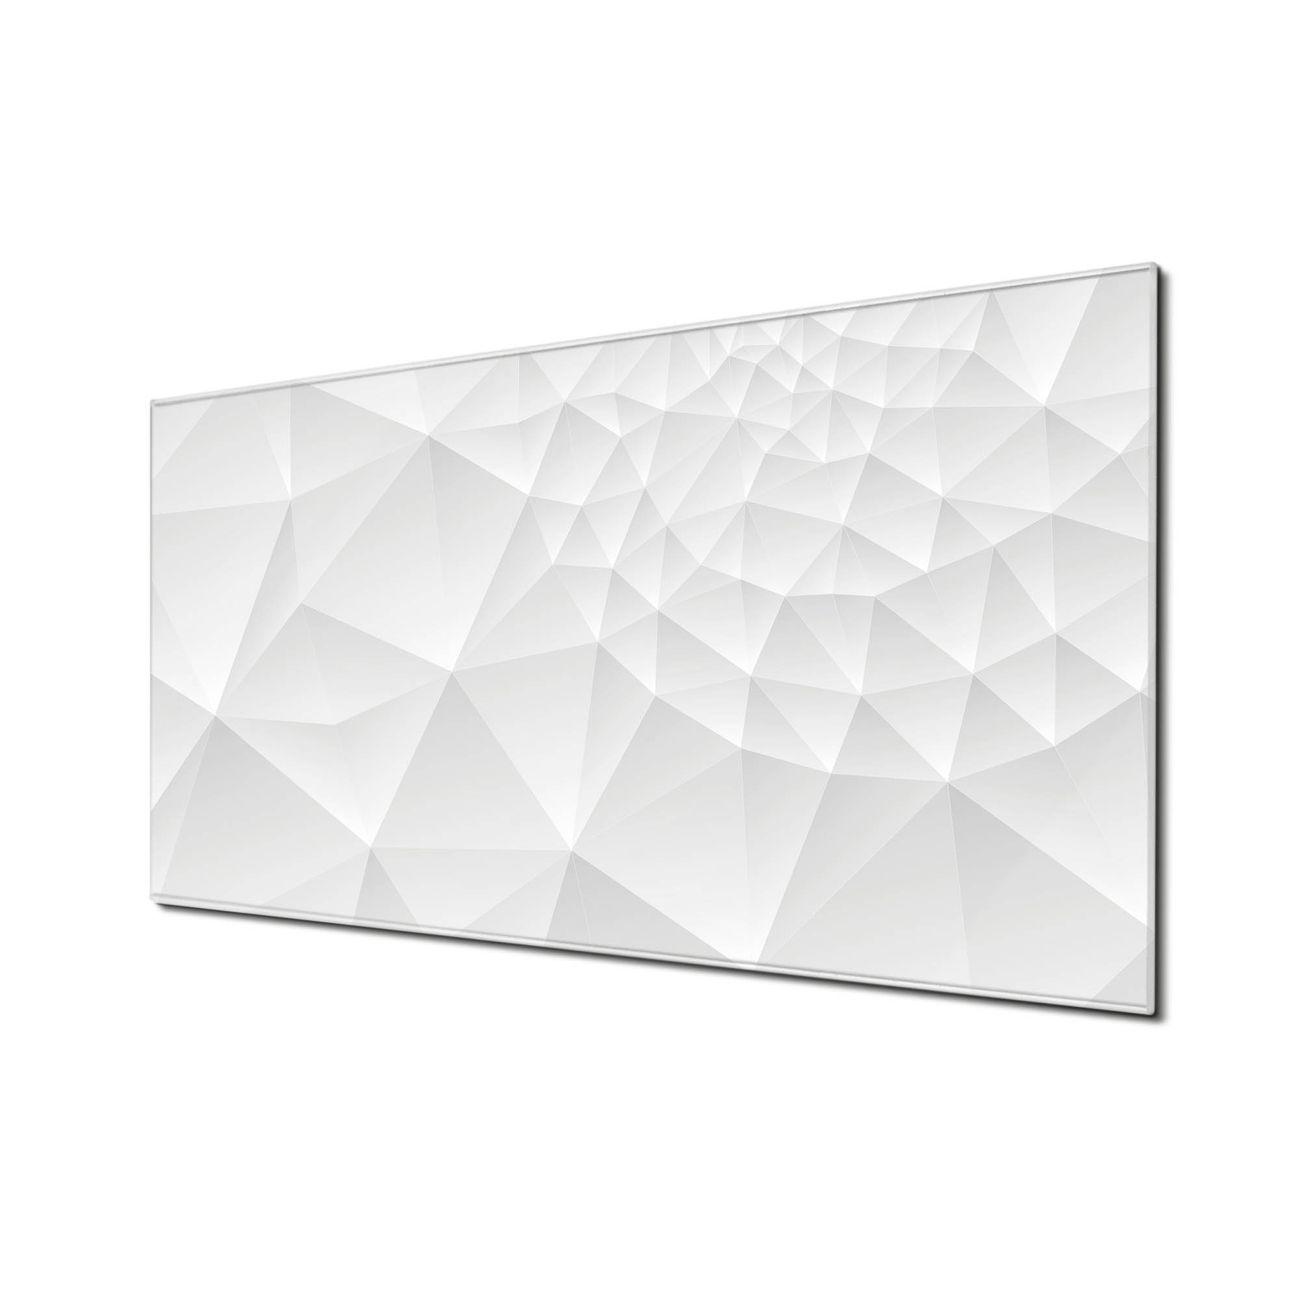 Küchenrückwand Glas Motiv Nautilus